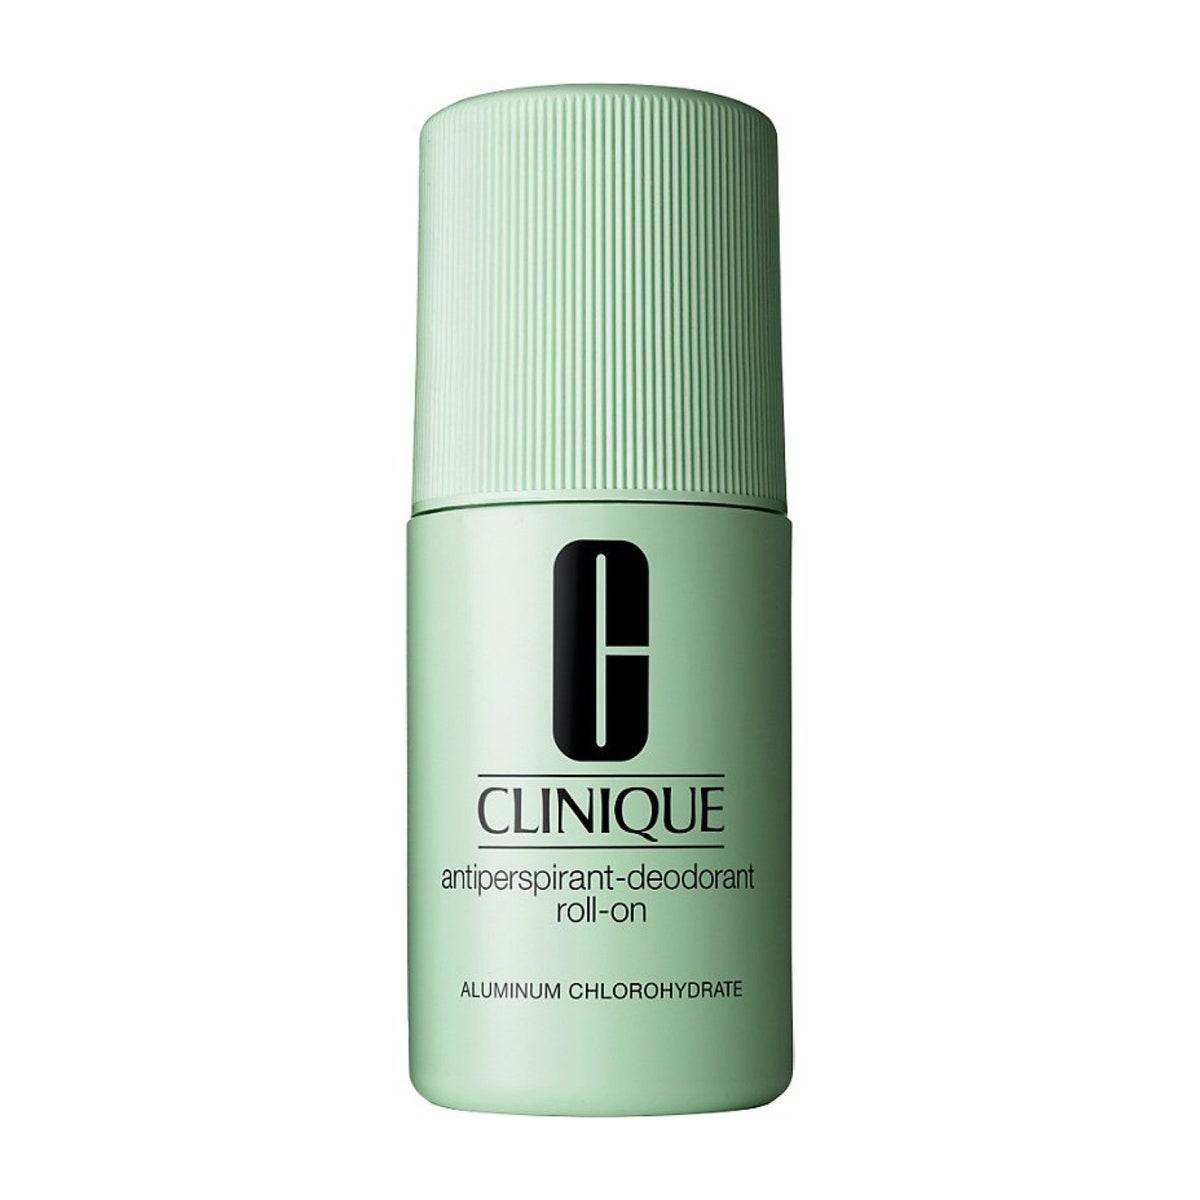 khử mùi cơ thể Clinique Antiperspirant-Deodorant Roll-On